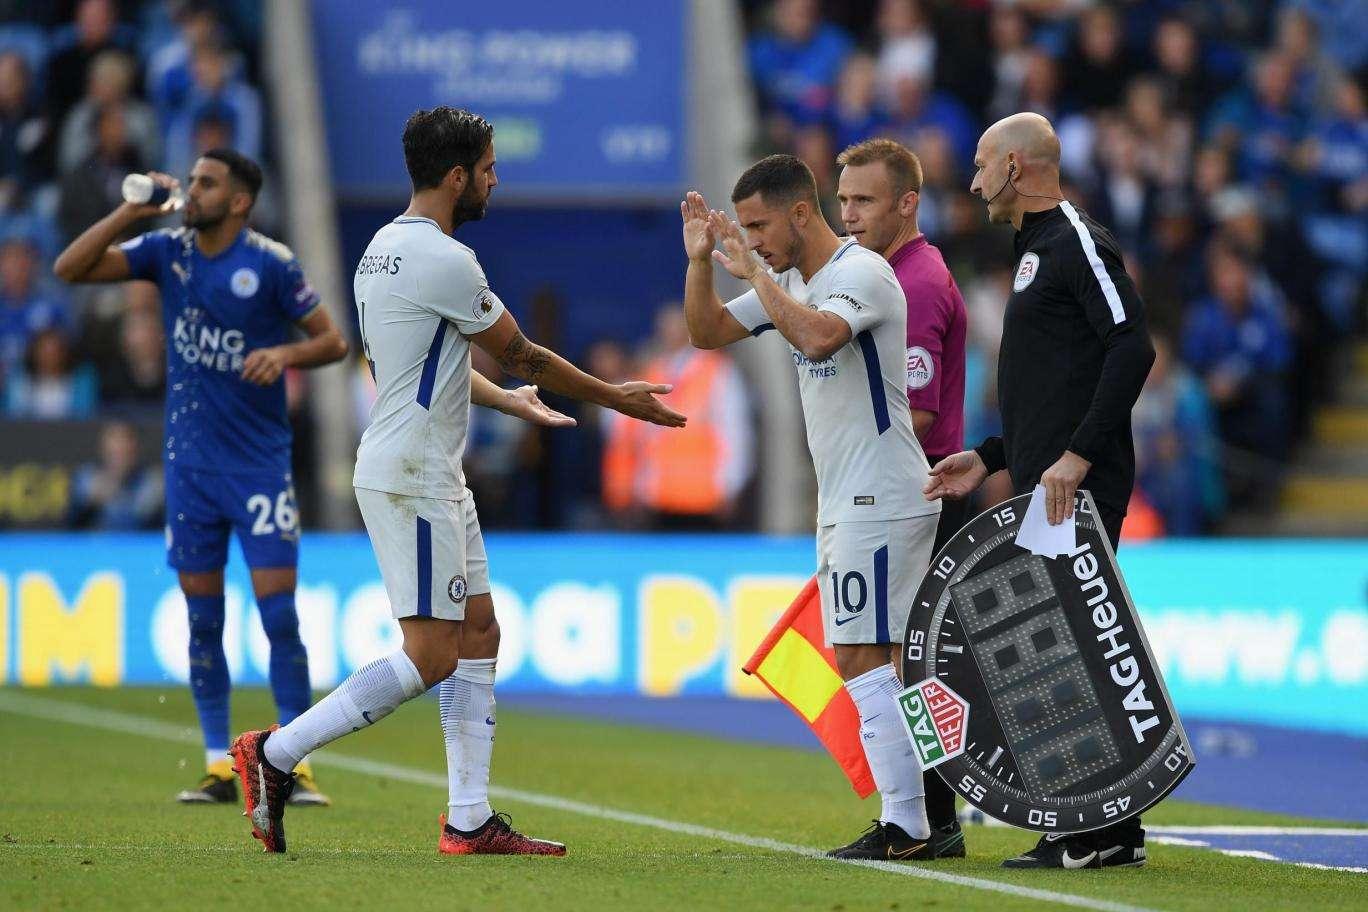 Chelsea vs Qarabag ngày 13/9/2017 giải Cup C1 Champions League